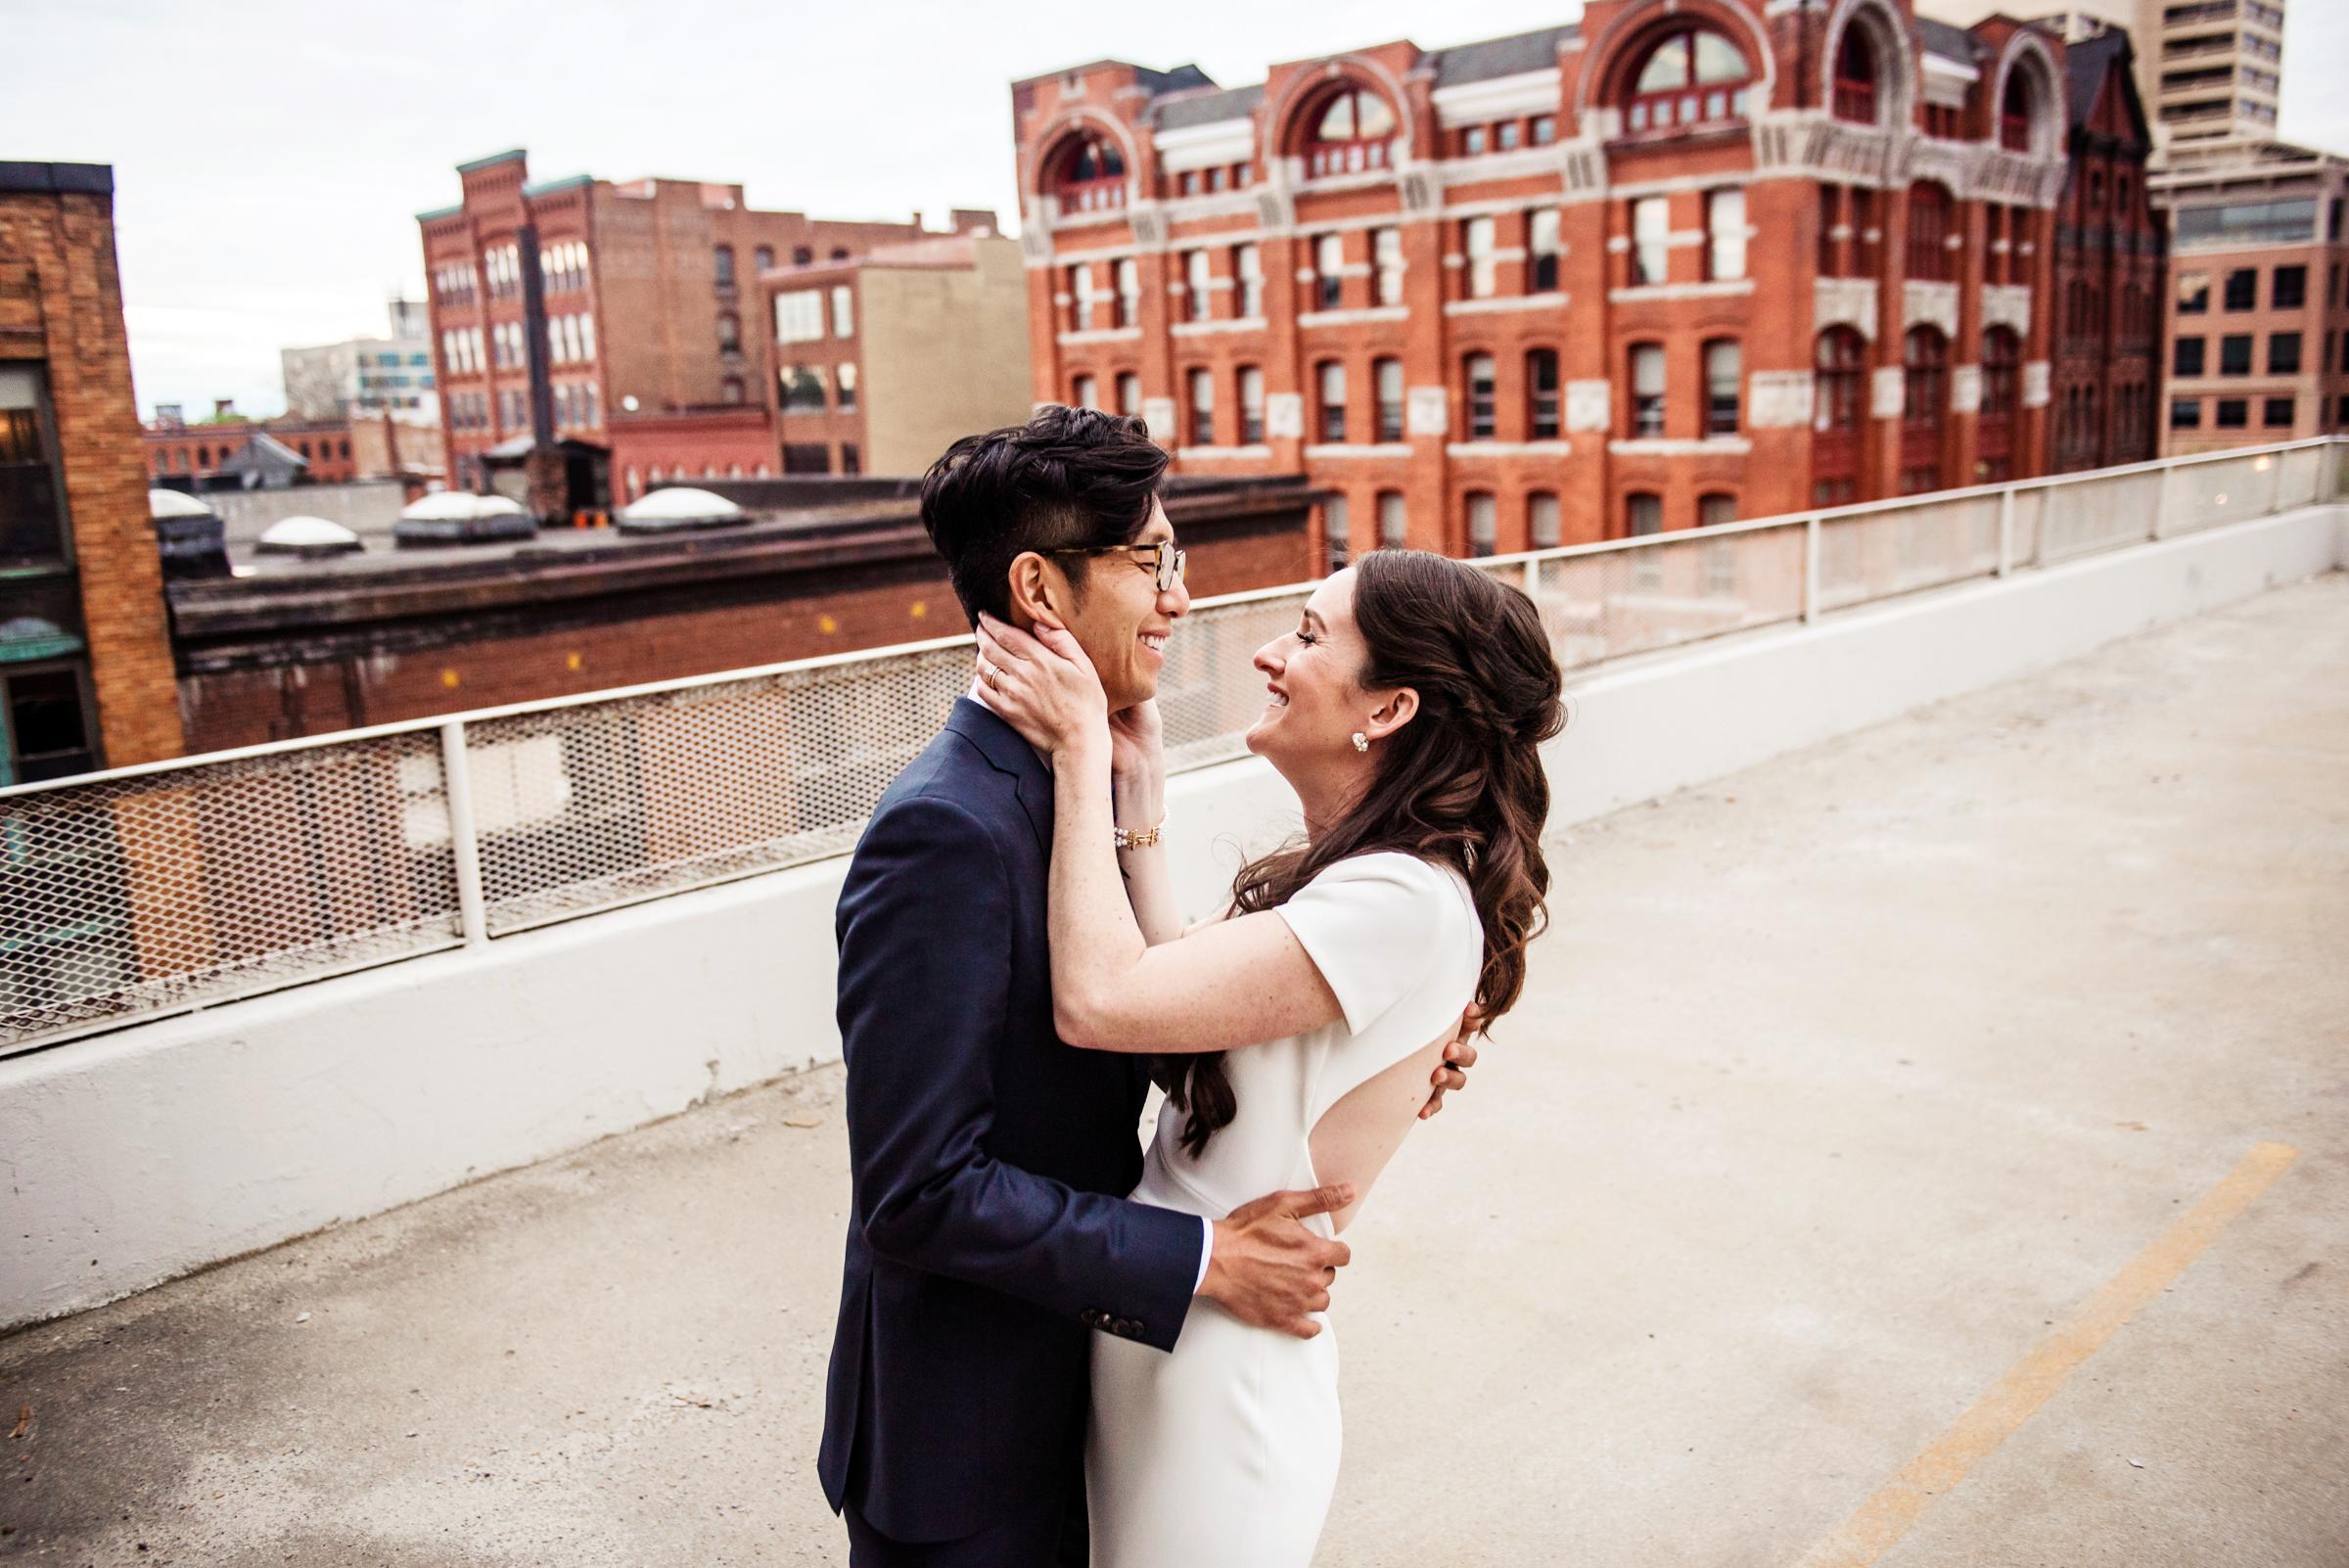 SKY_Armory_Syracuse_Wedding_JILL_STUDIO_Rochester_NY_Photographer_DSC_6259.jpg